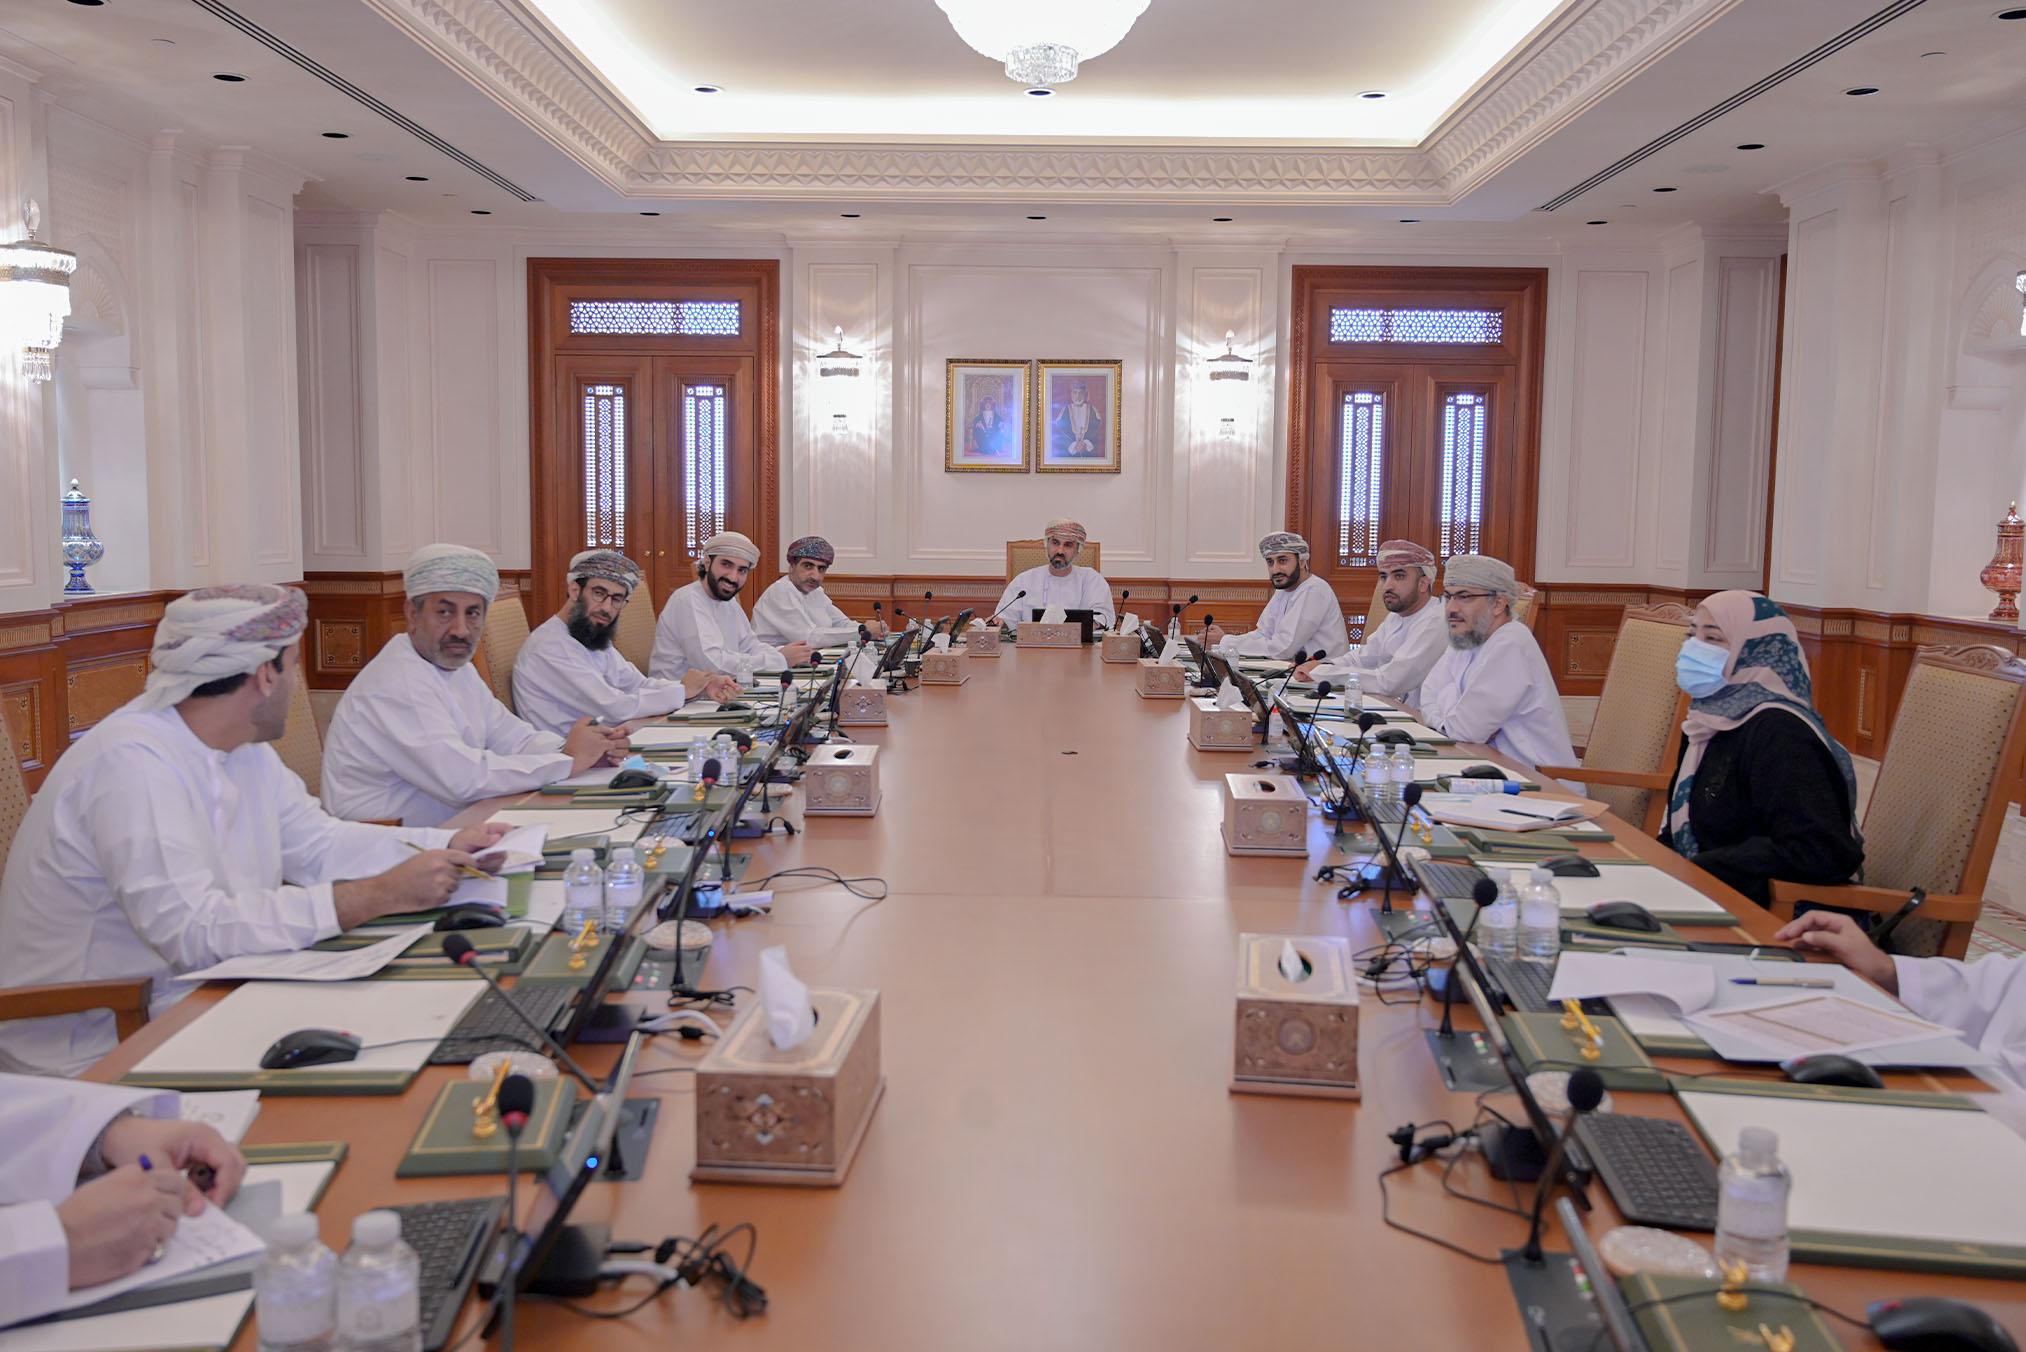 Majlis praises HM's order on panel to oversee restart of normal economic activites